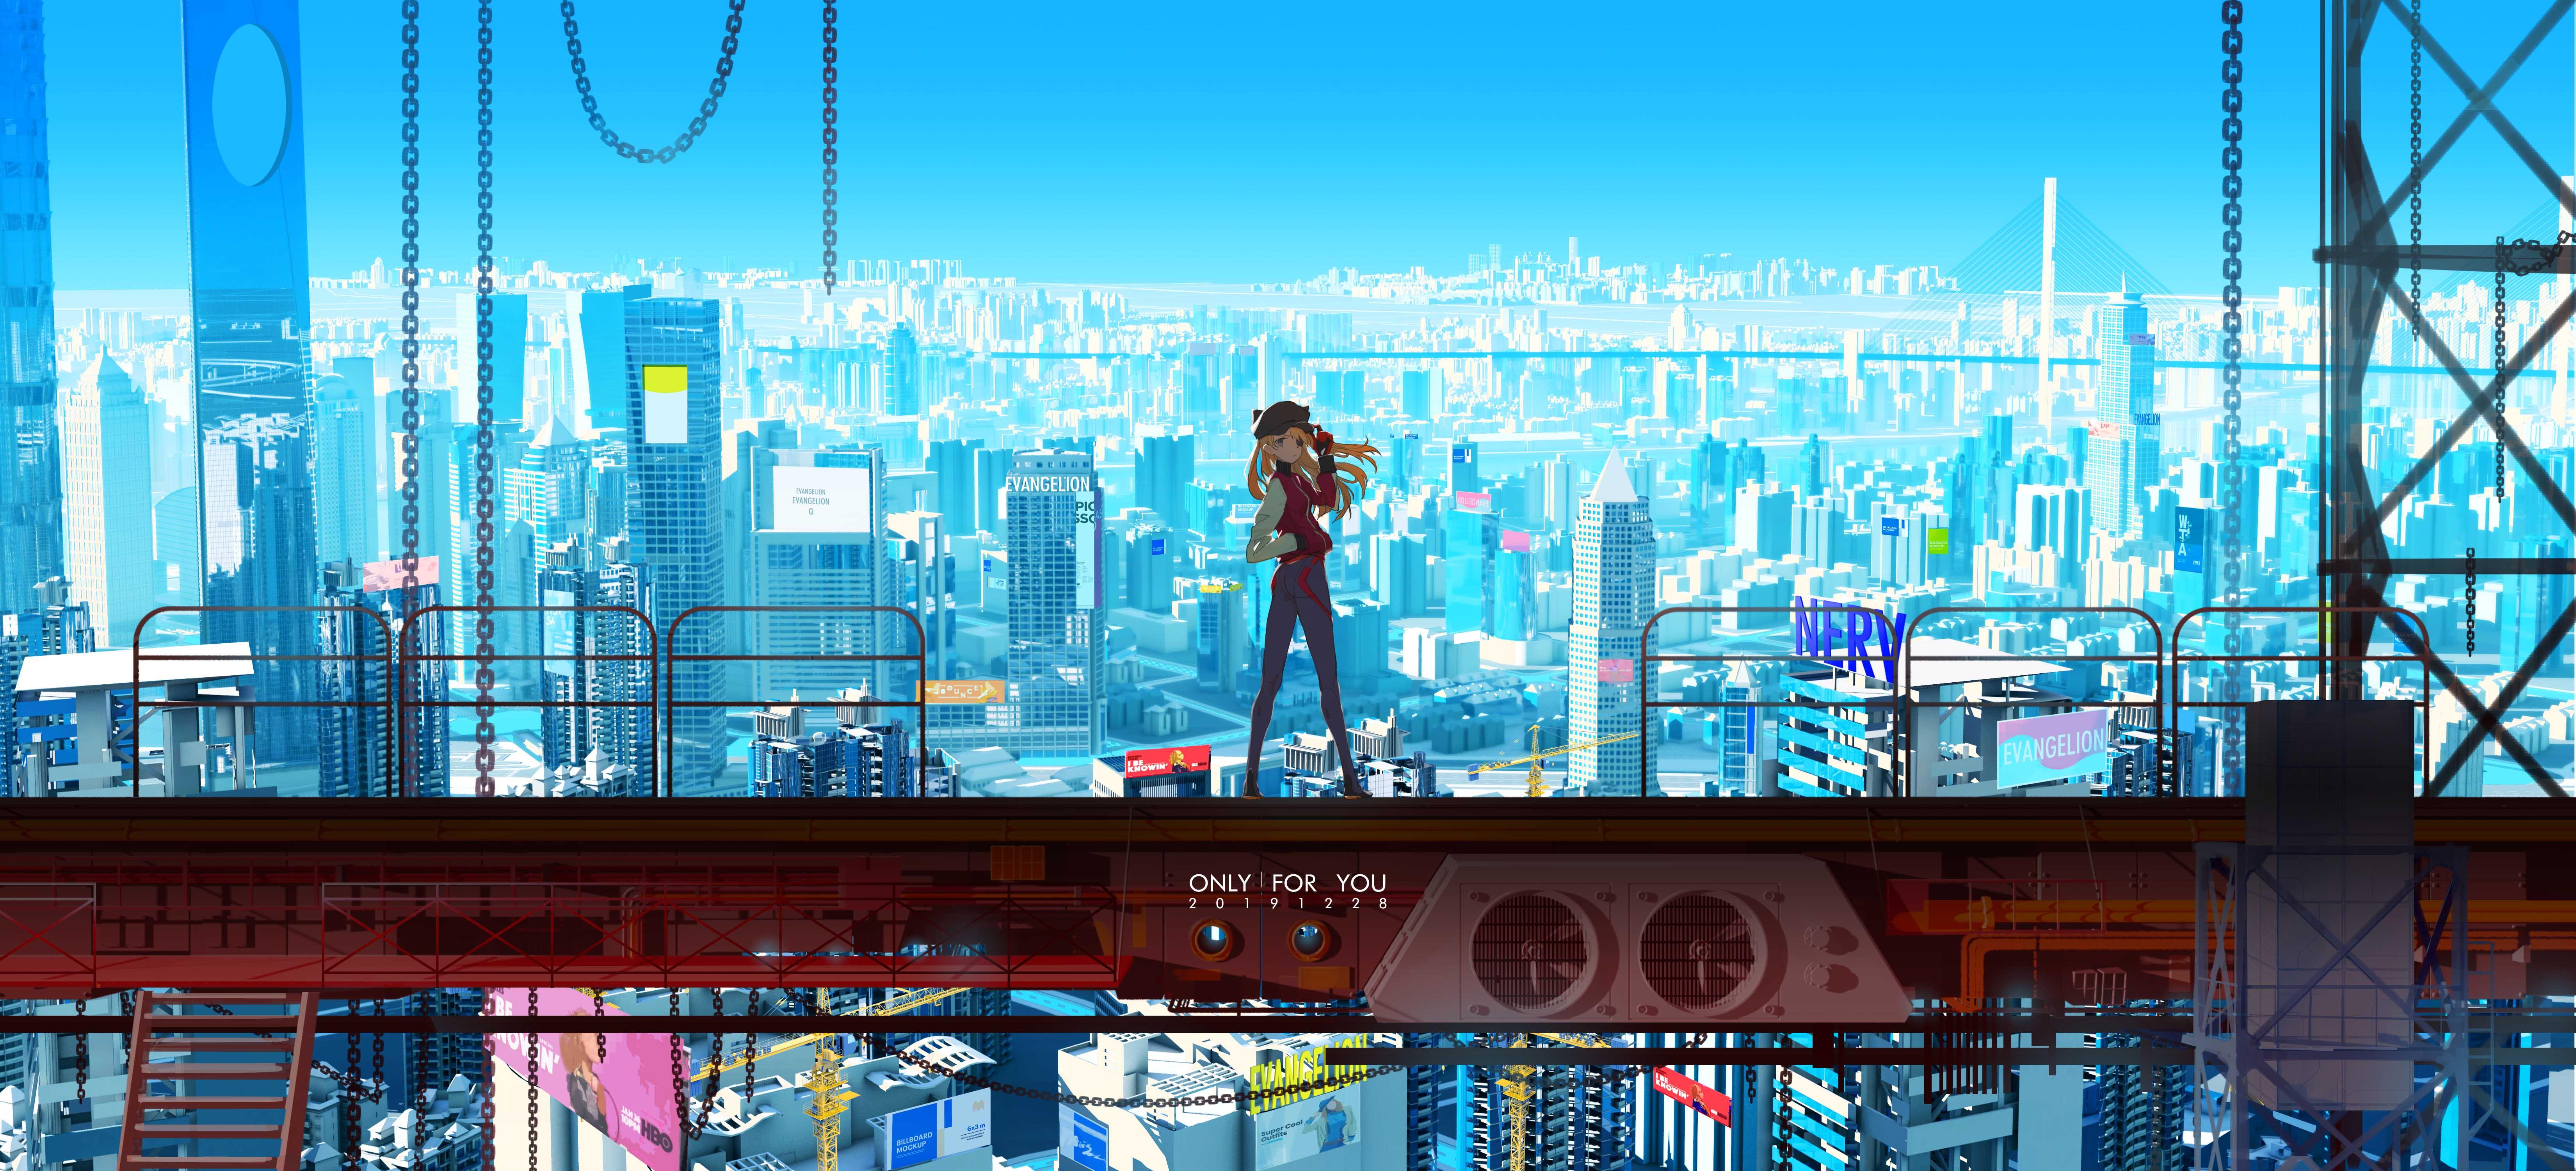 Anime Wallpaper Asuka from Neon Genesis Evangelion